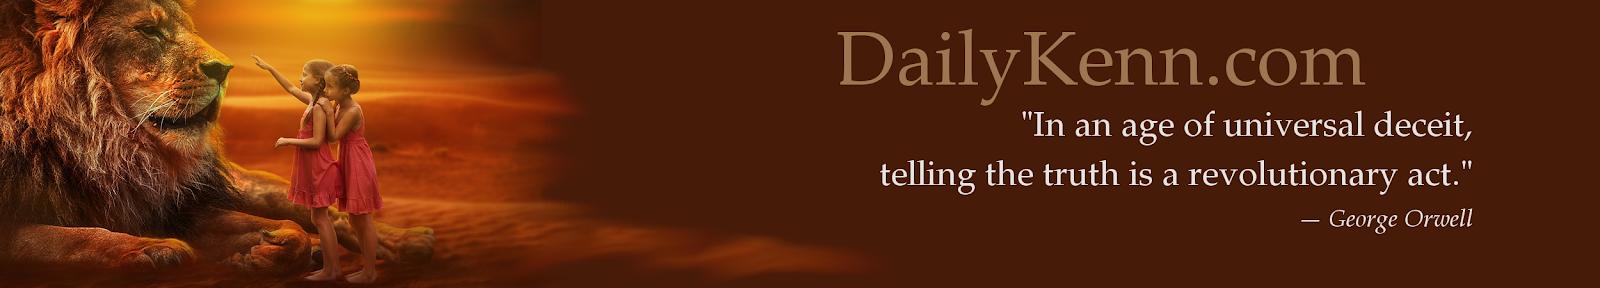 DailyKenn.com